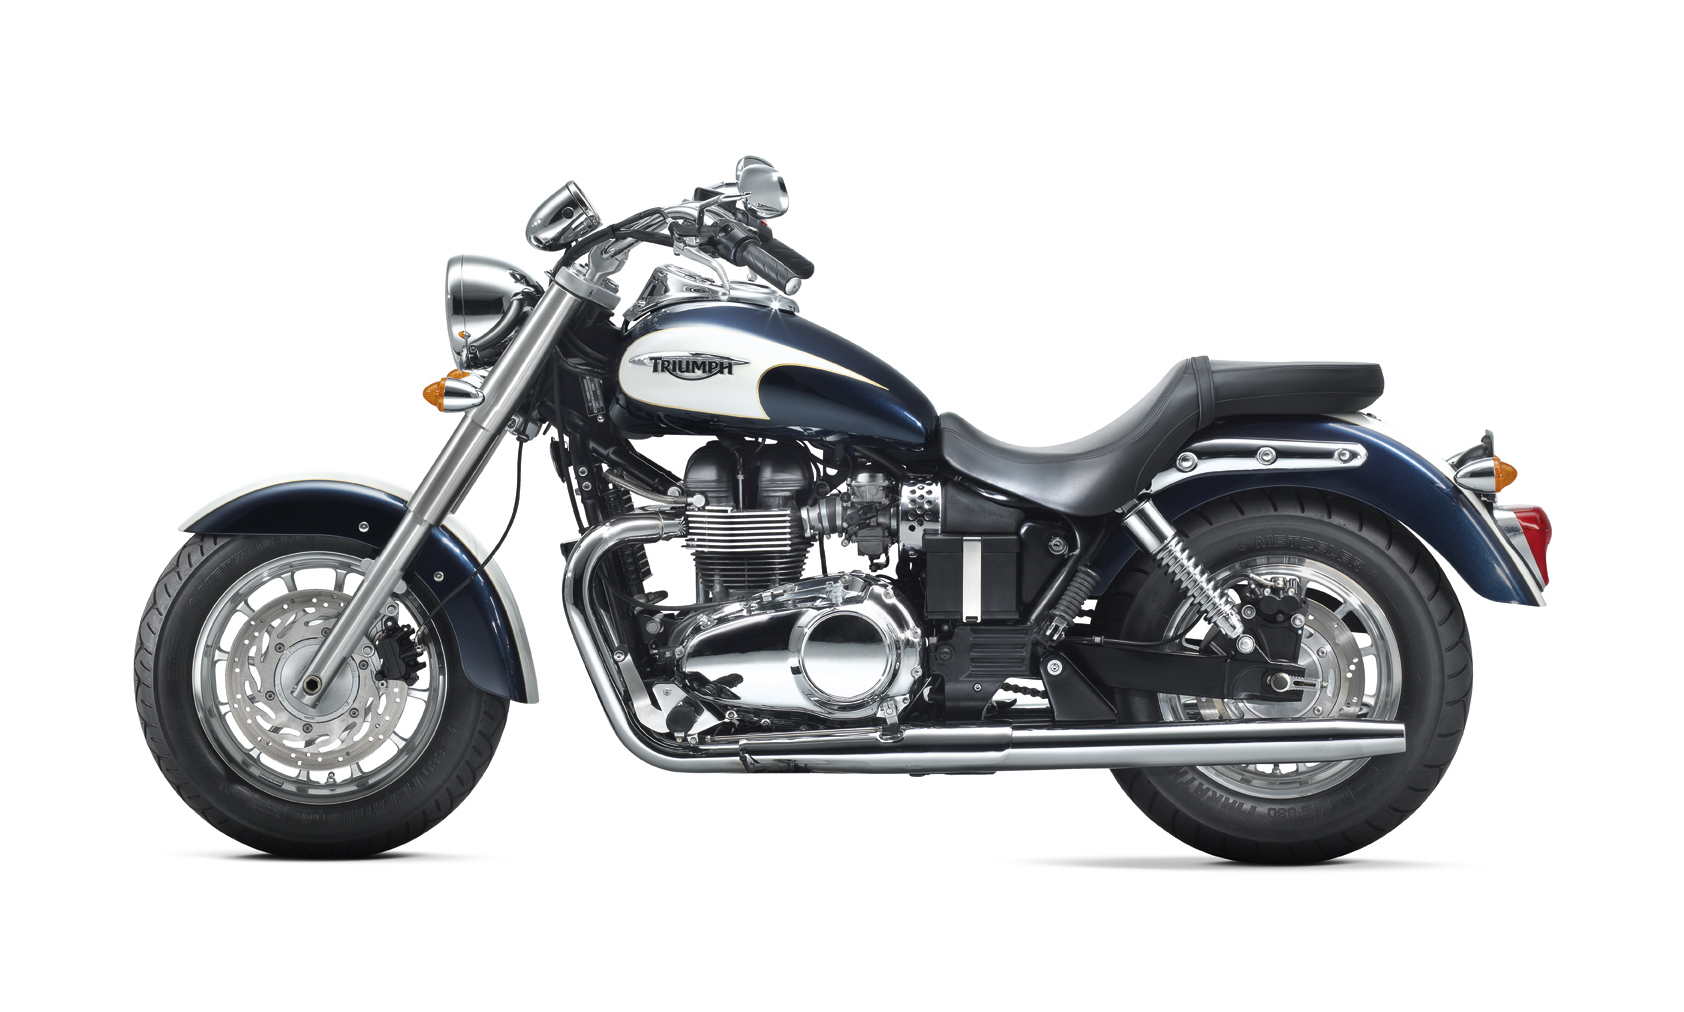 2011 Triumph America Motorcycle Mojo